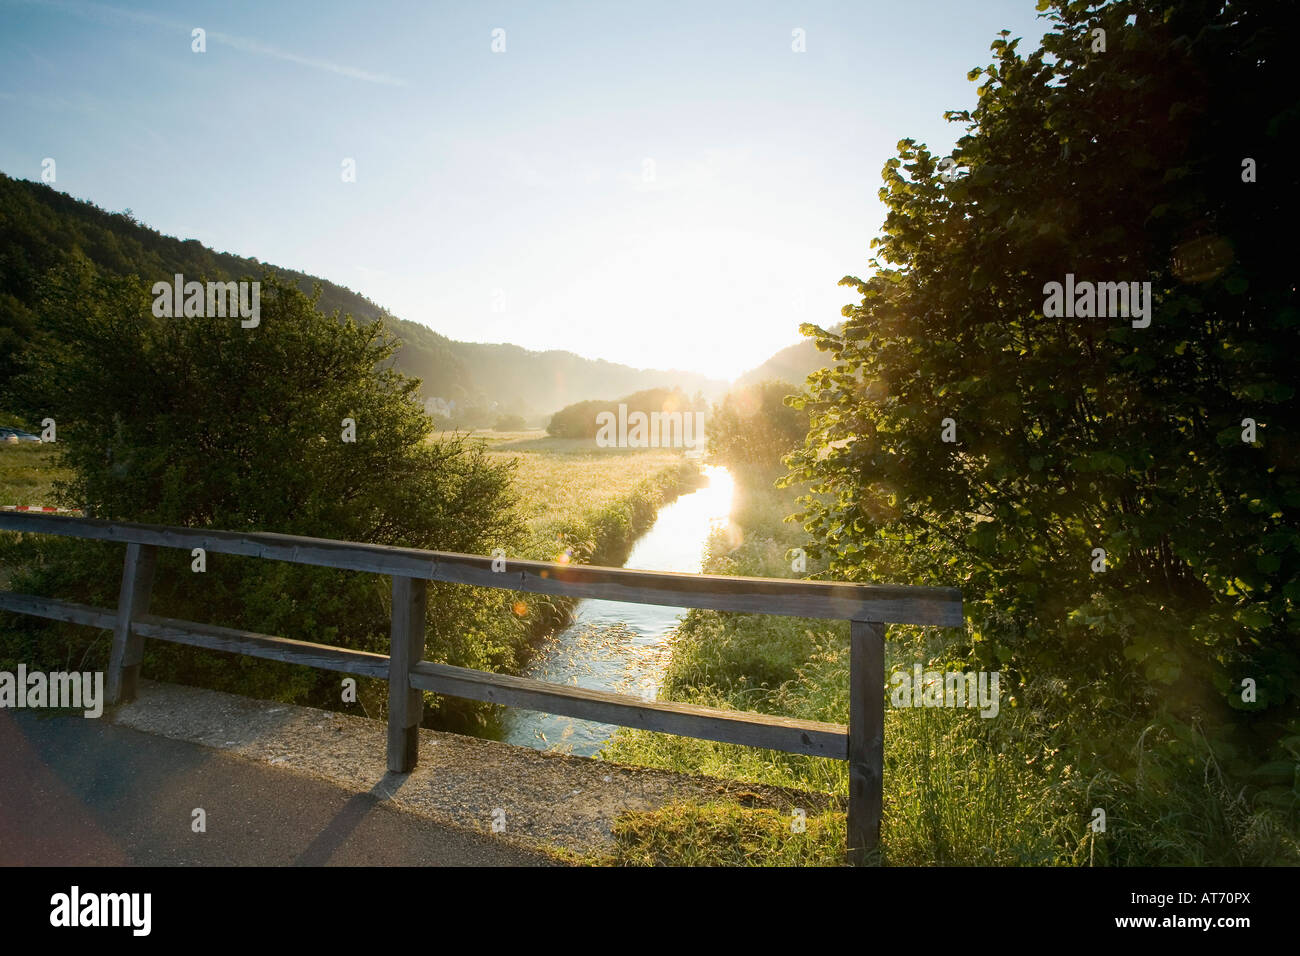 Deutschland, Bayern, Trubachtal Stockbild